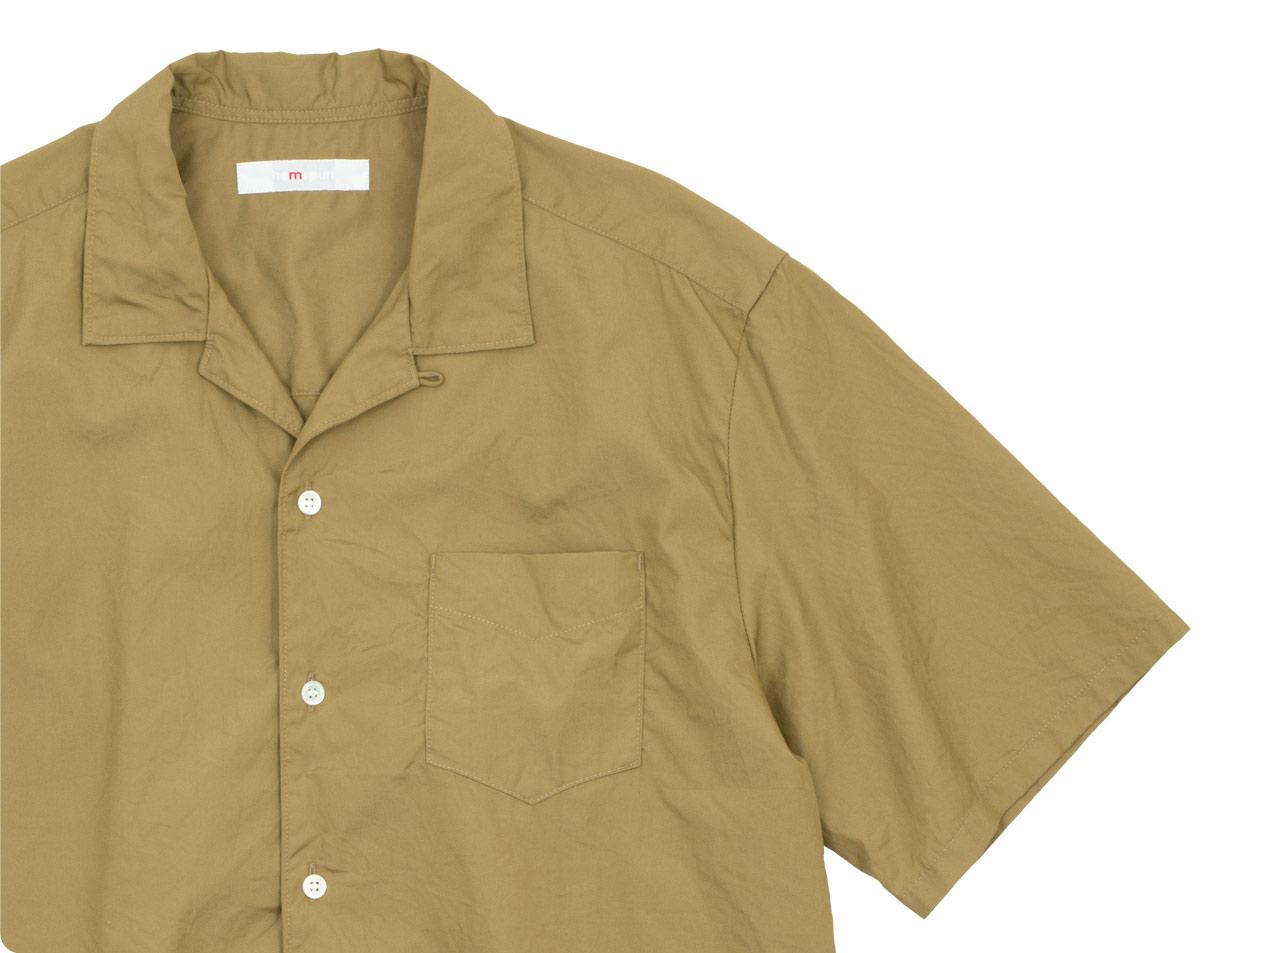 homspun 100/2ブロード オープンカラーシャツ